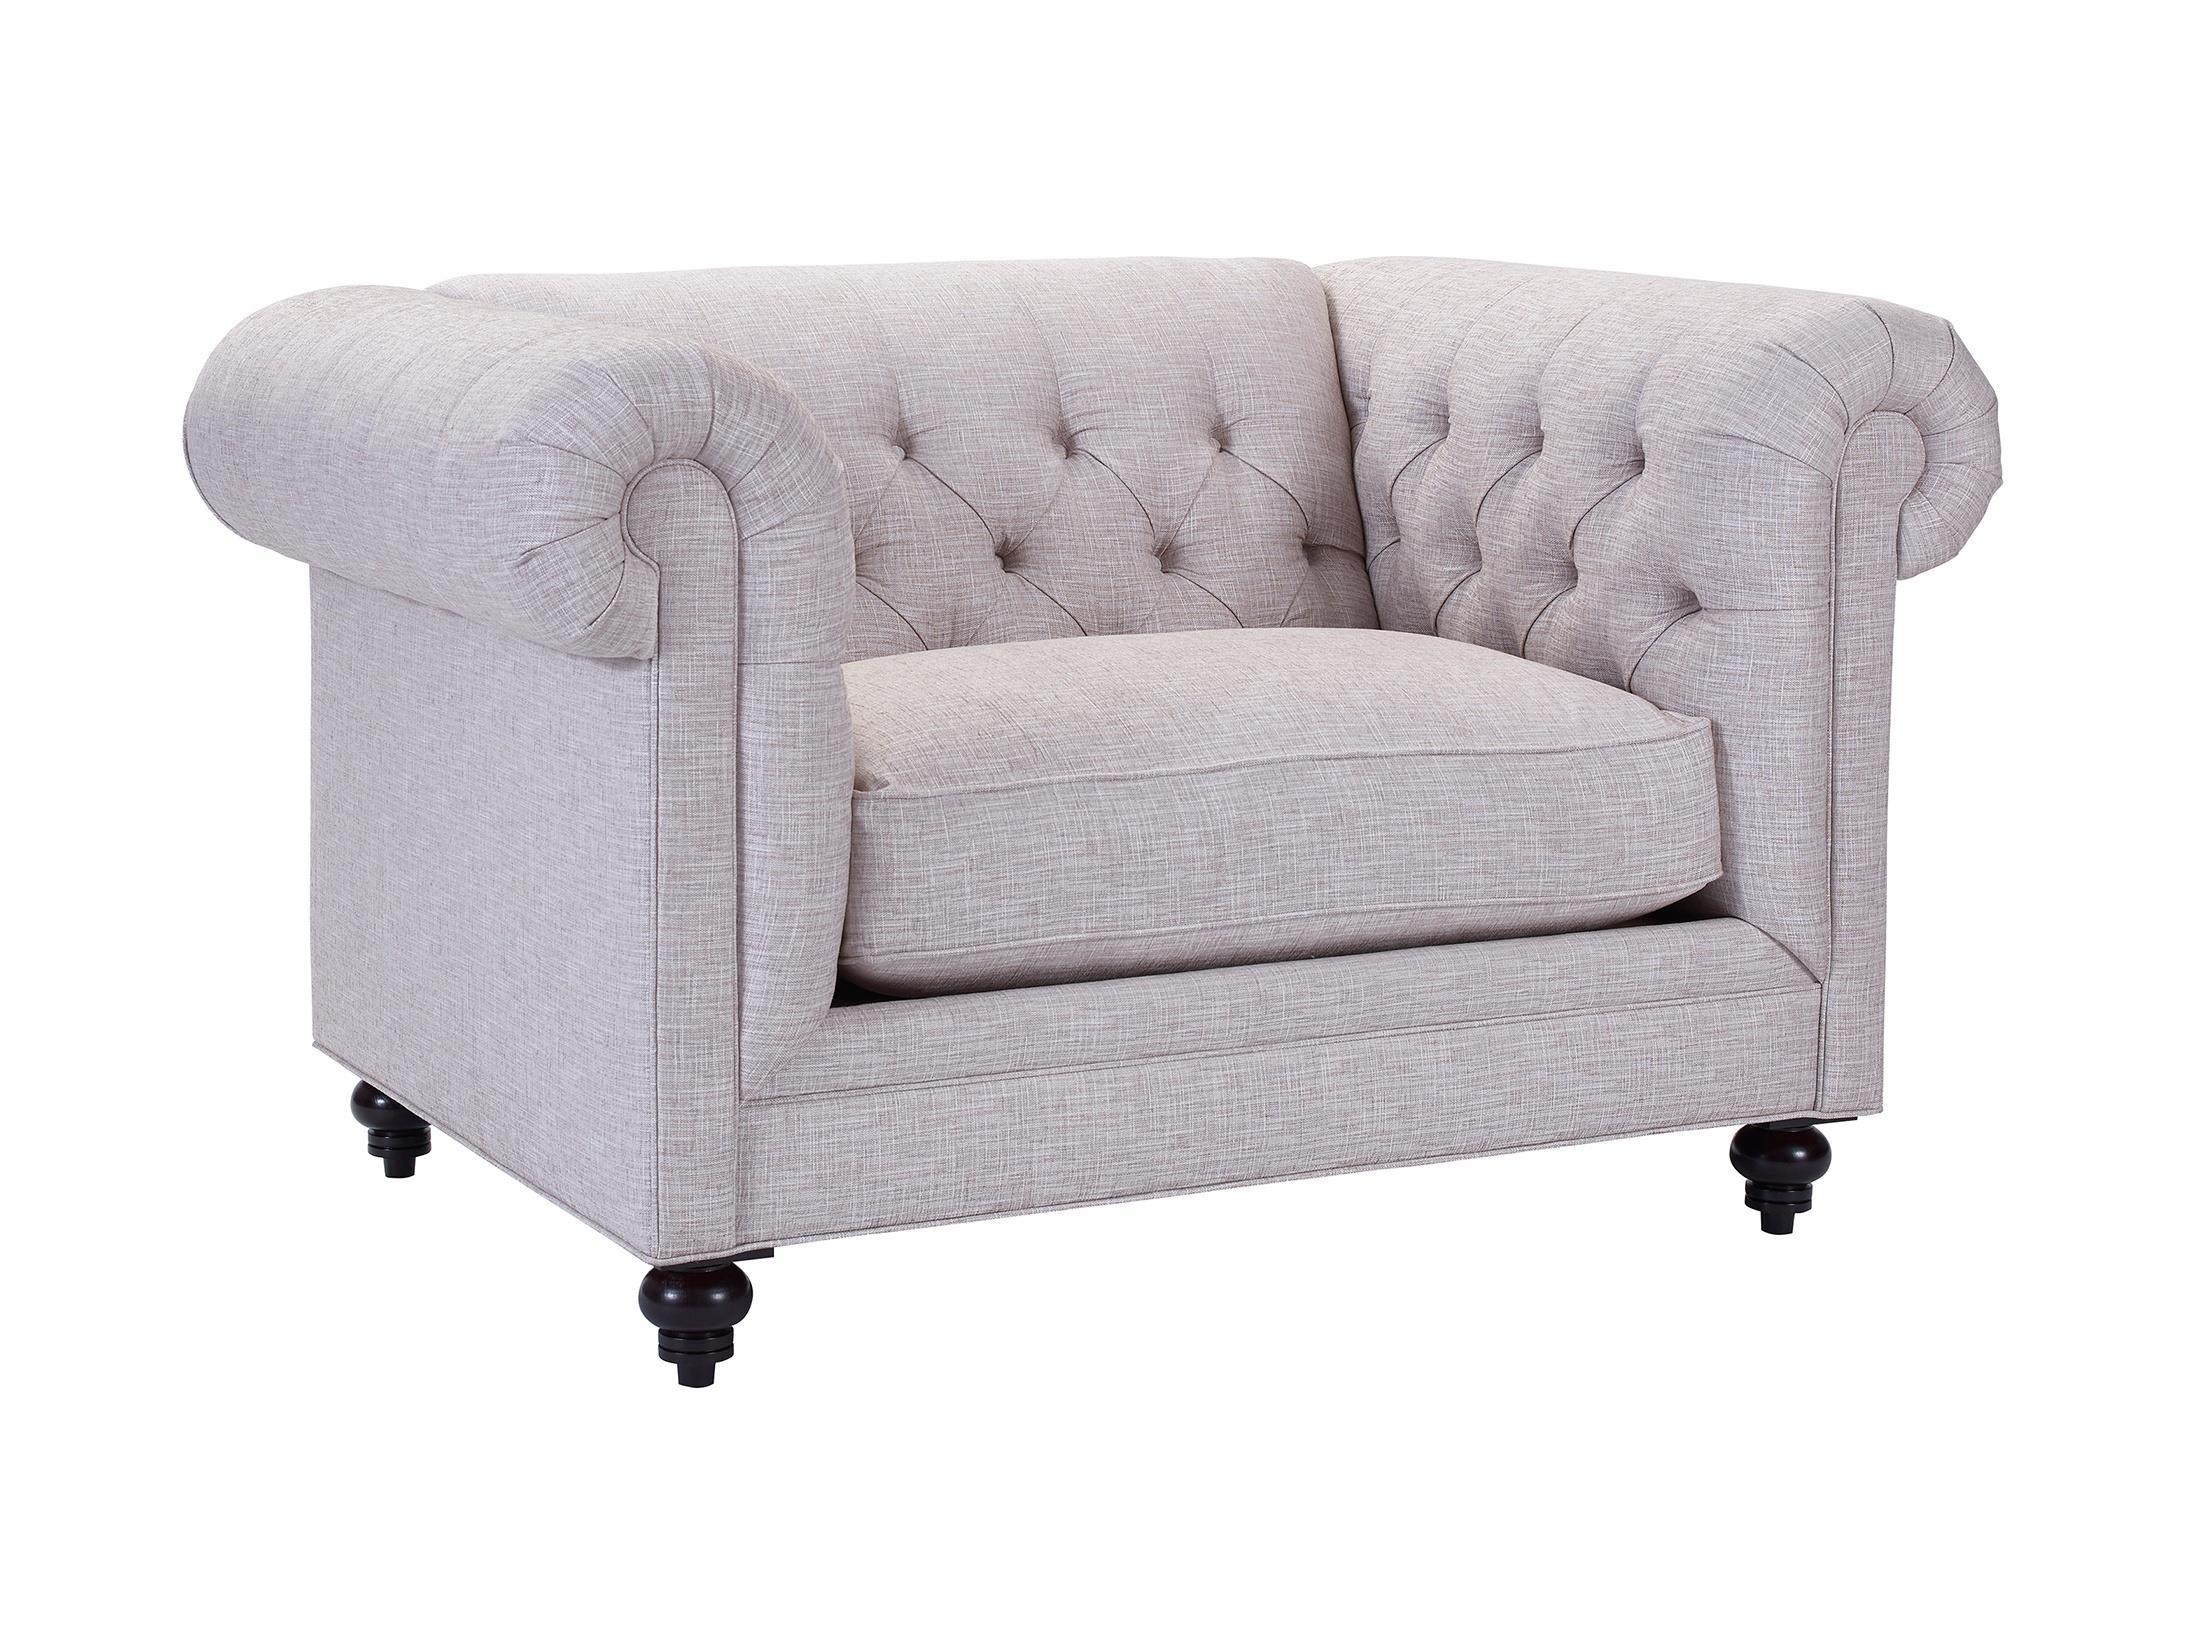 Broyhill Furniture Heath Traditional Chesterfield Chair U0026 1/2